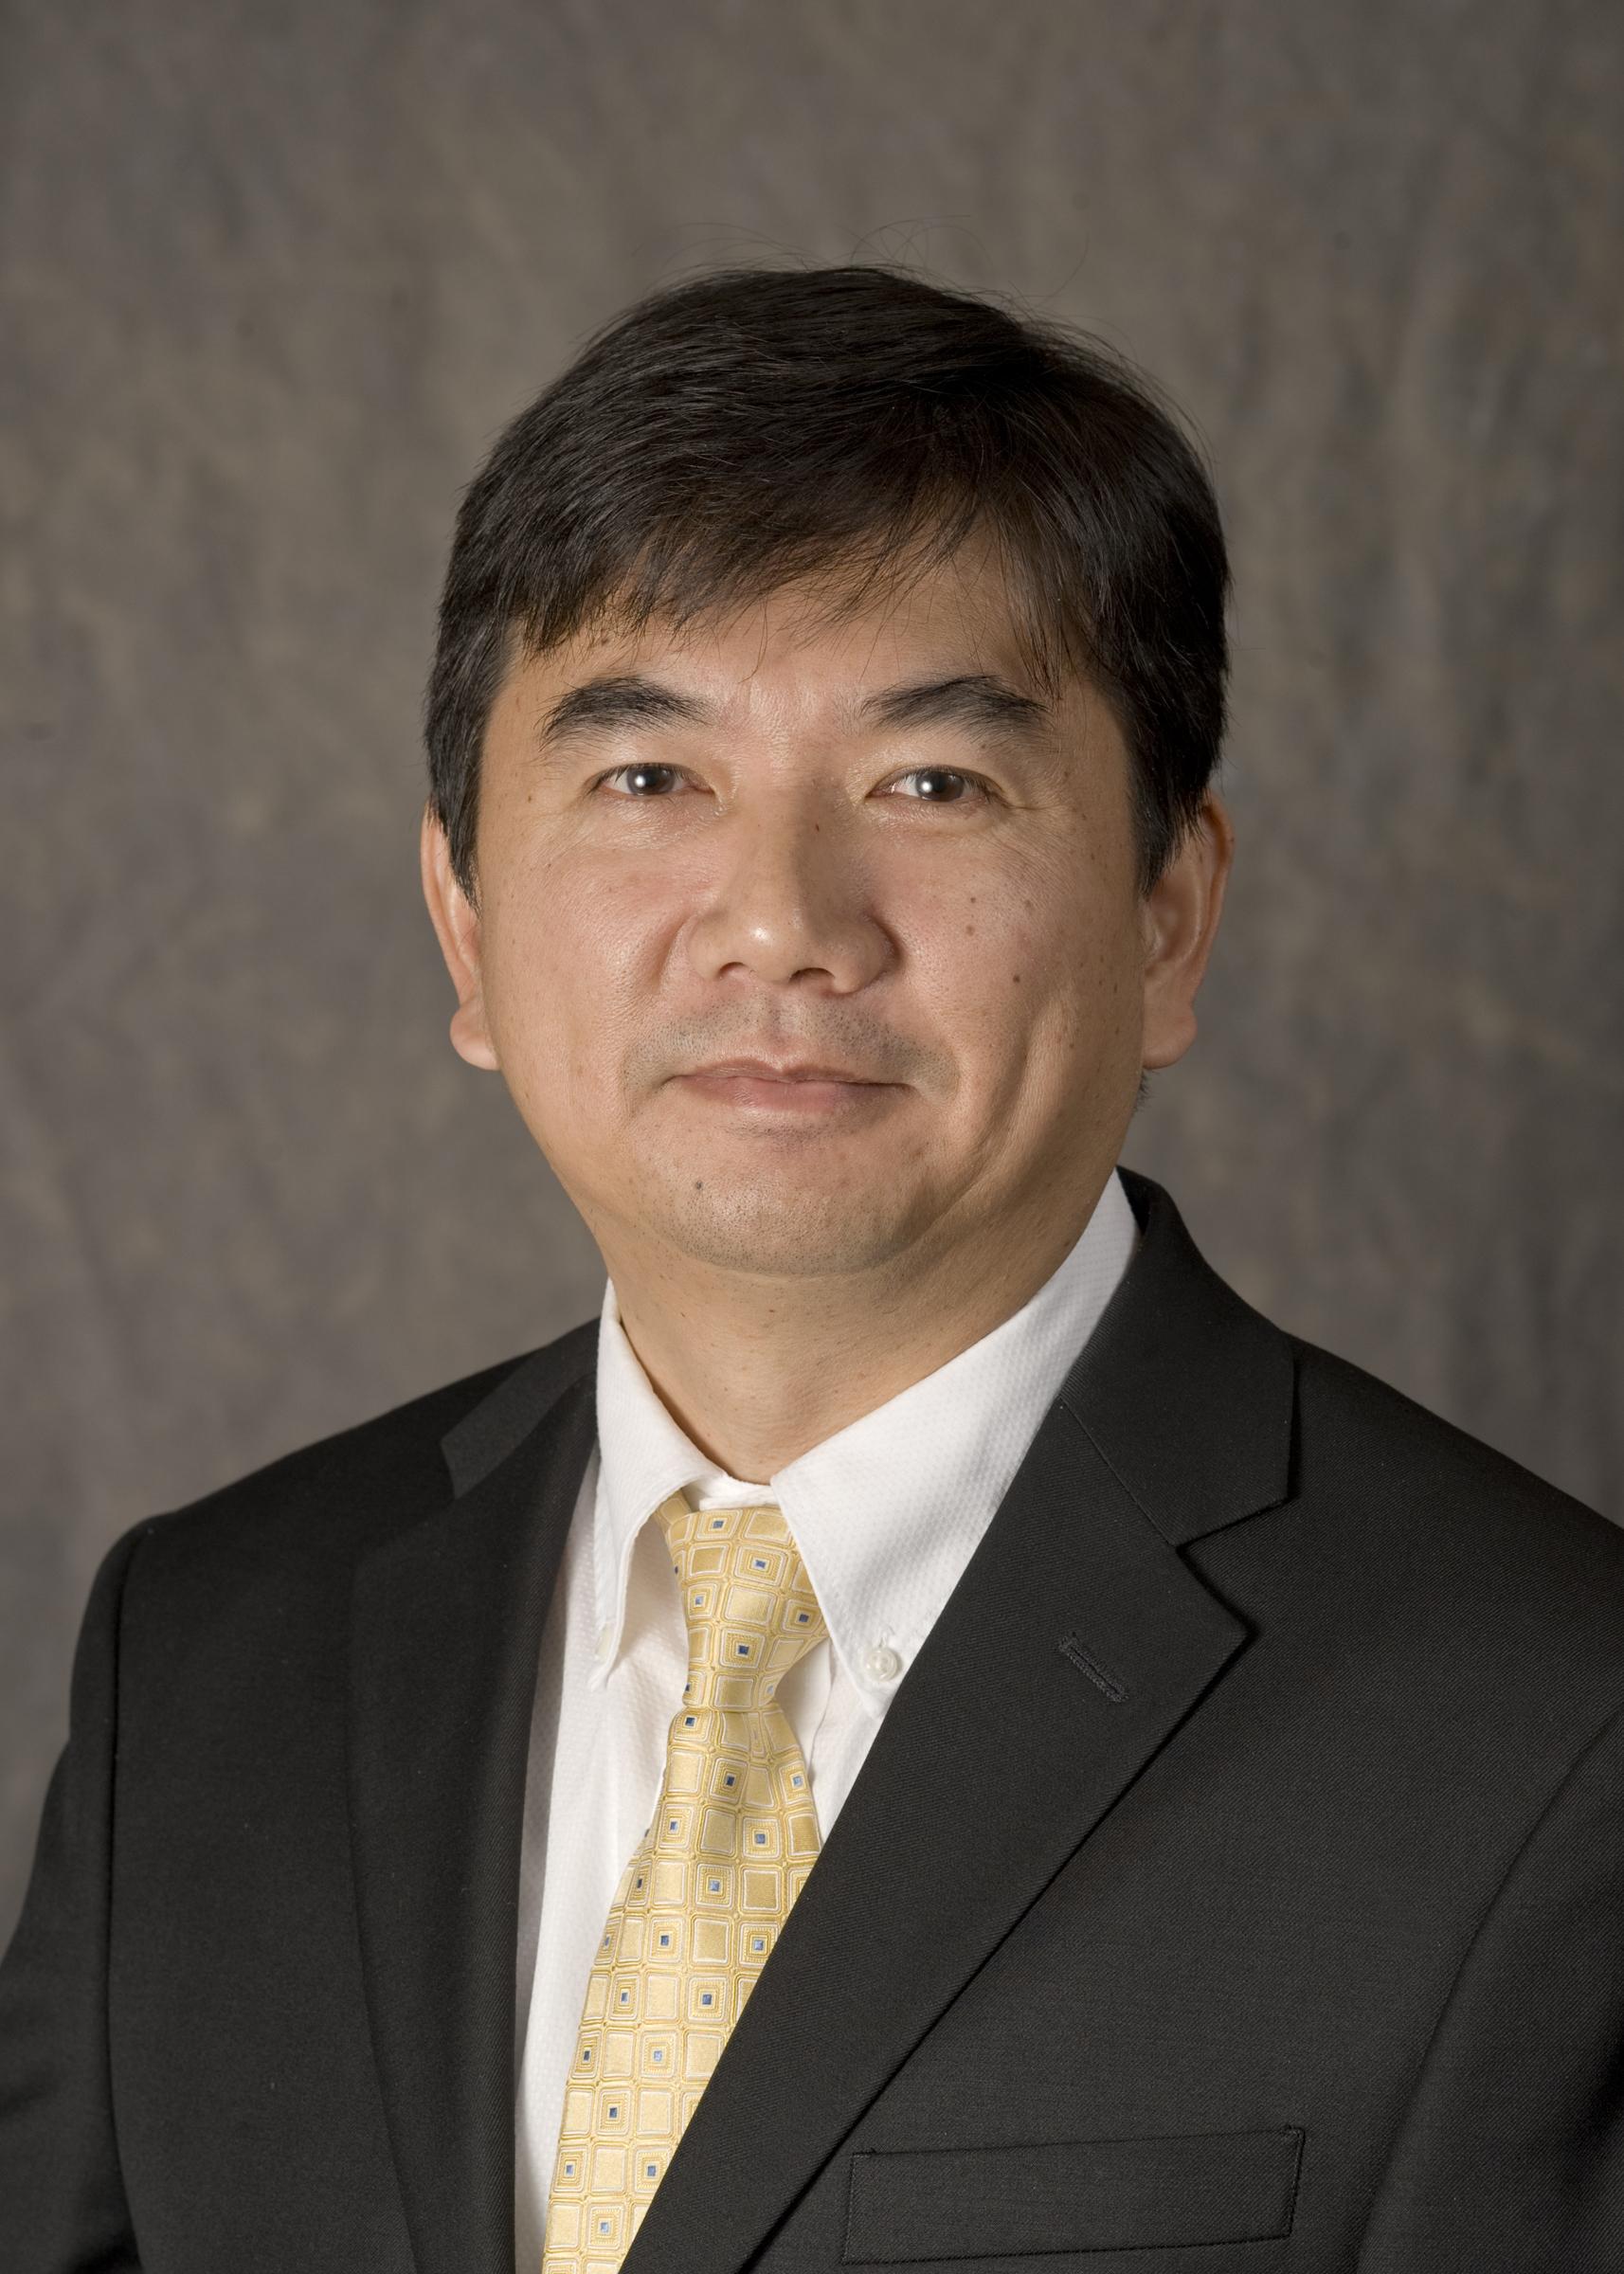 IIHR Research Engineer Ching-Long Lin.